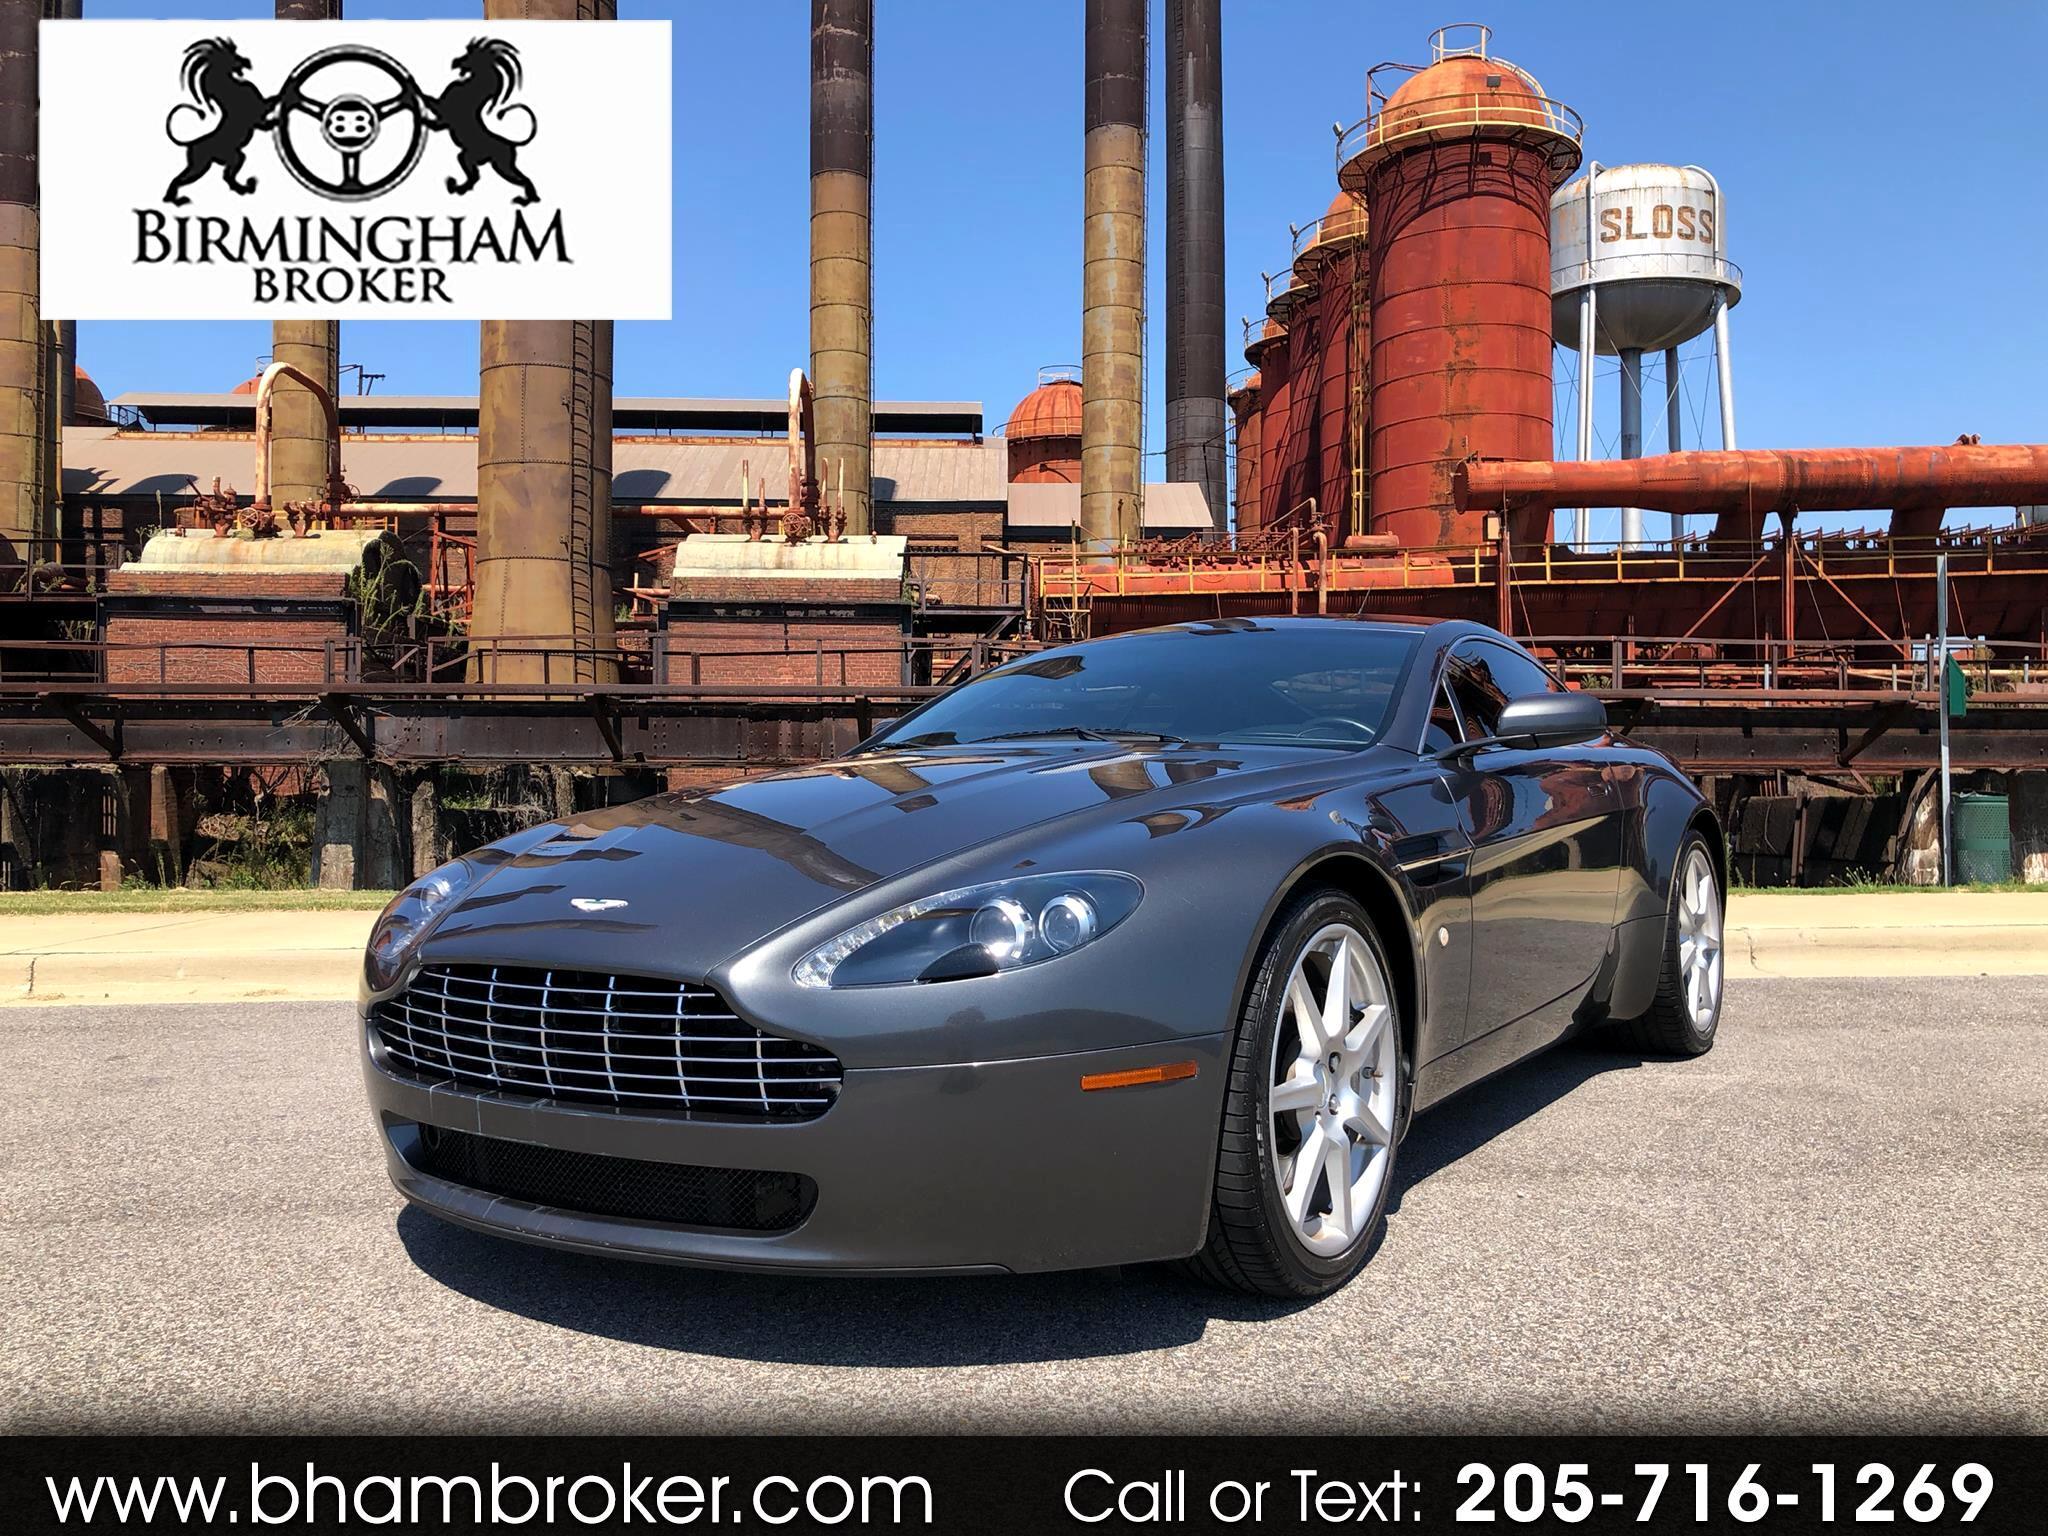 Used Cars for Sale Birmingham AL 35233 Birmingham Broker